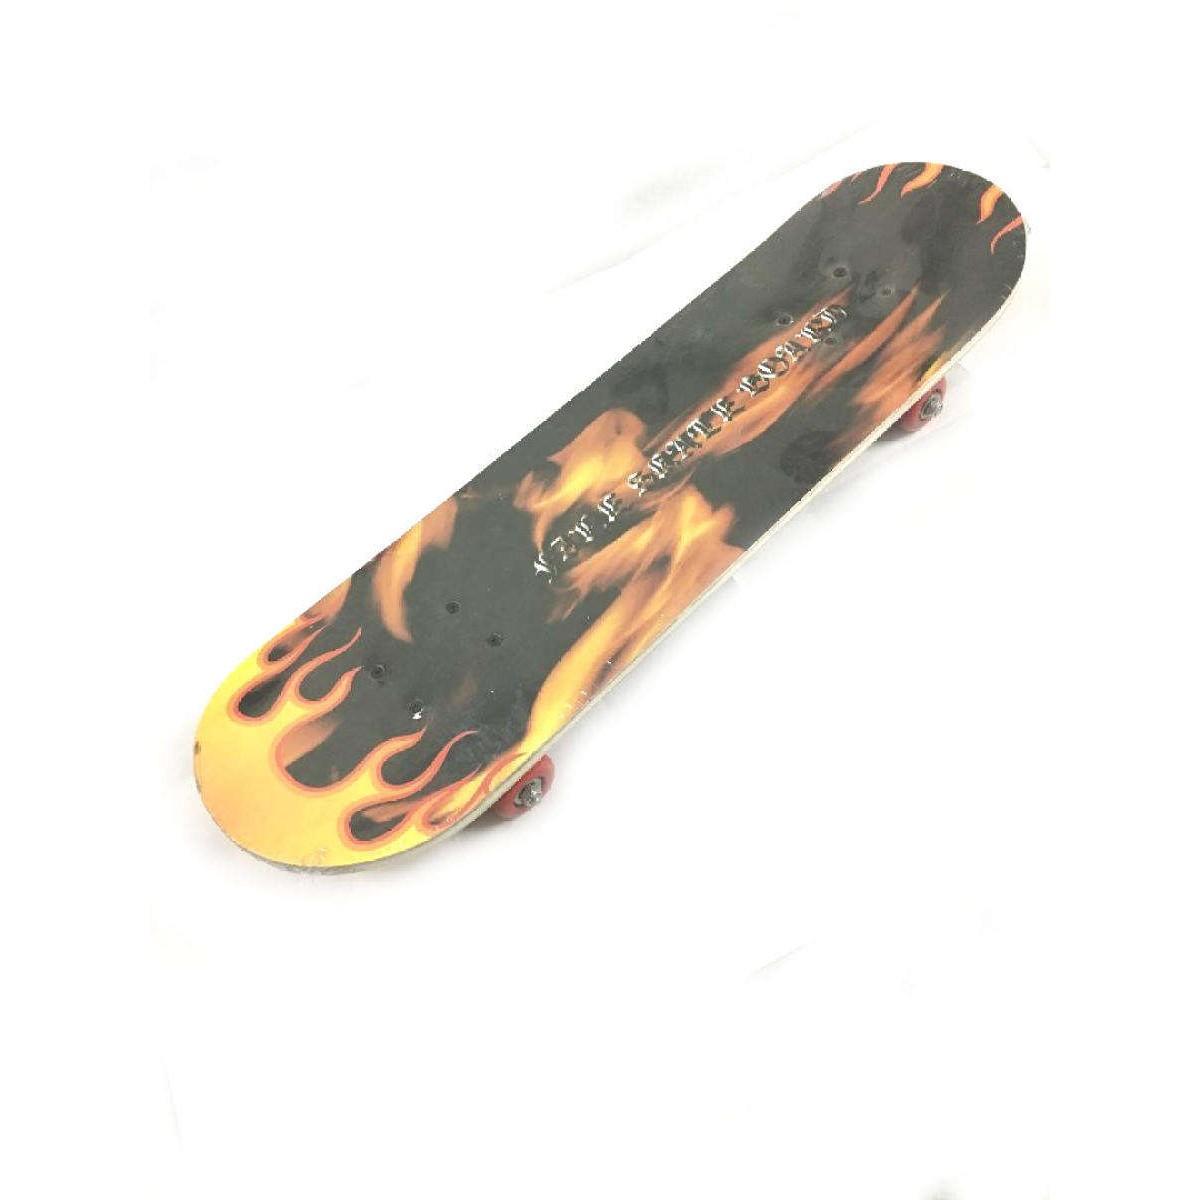 "Skateboard 27"" Large Wood for Teens Adults Beginners Girls Boys Kids (random design)"